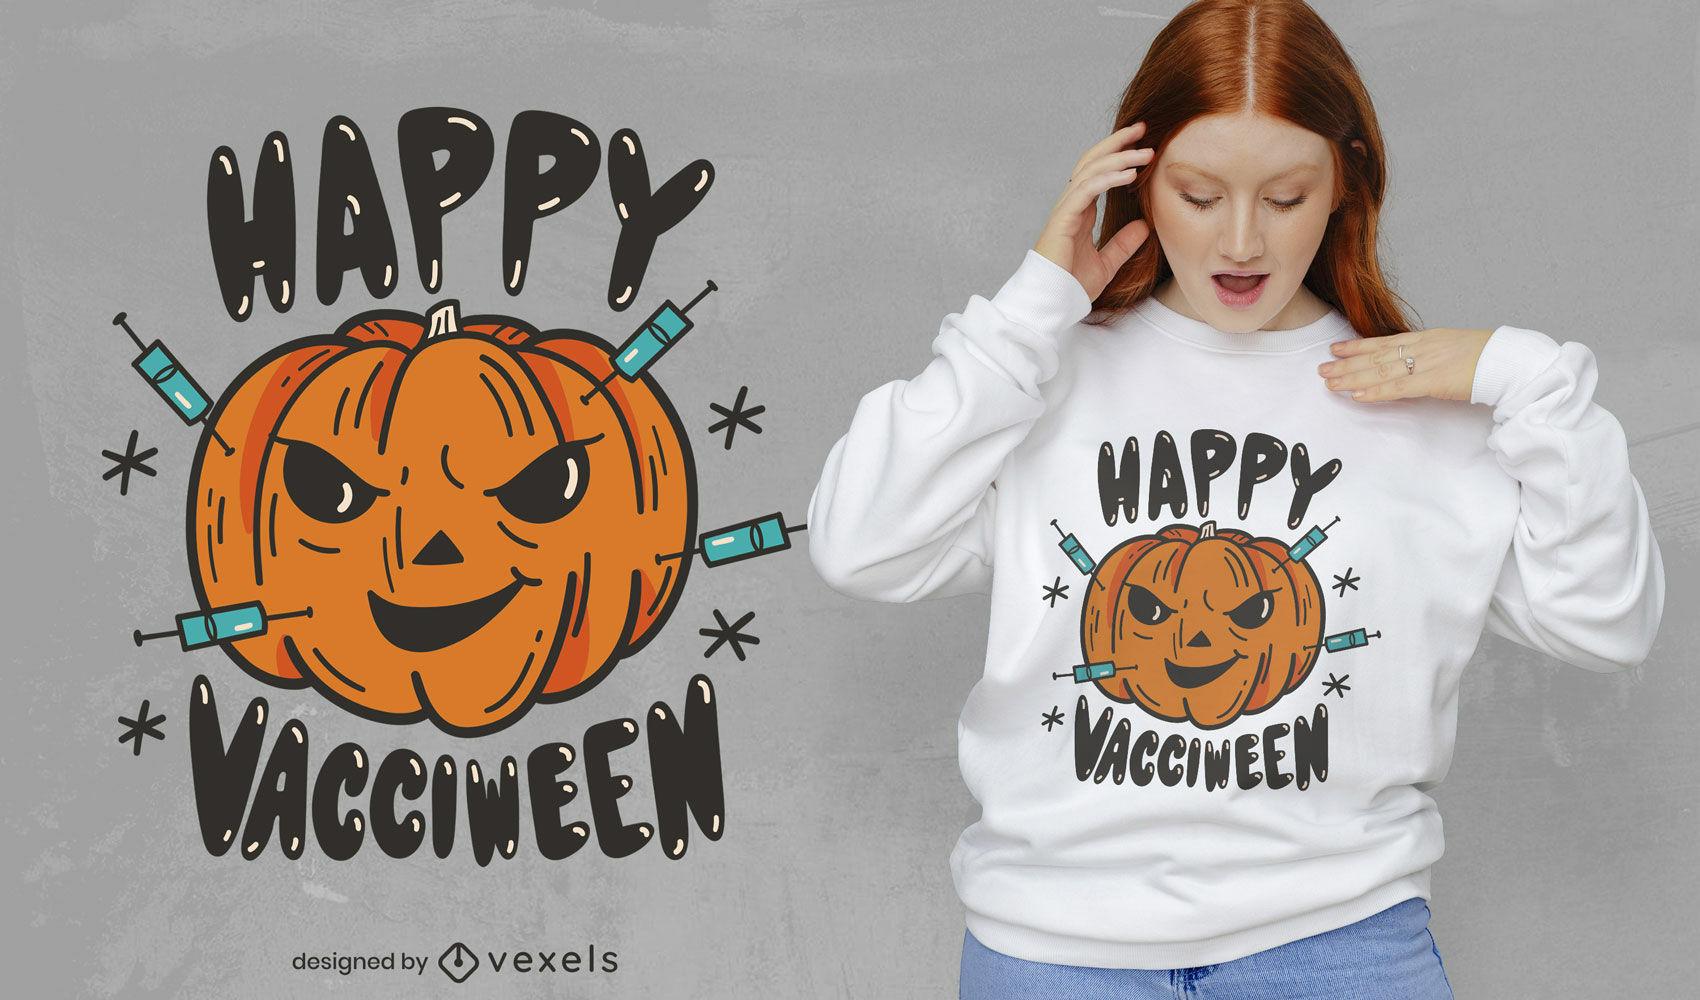 Lustiges Vacciween-T-Shirt-Design